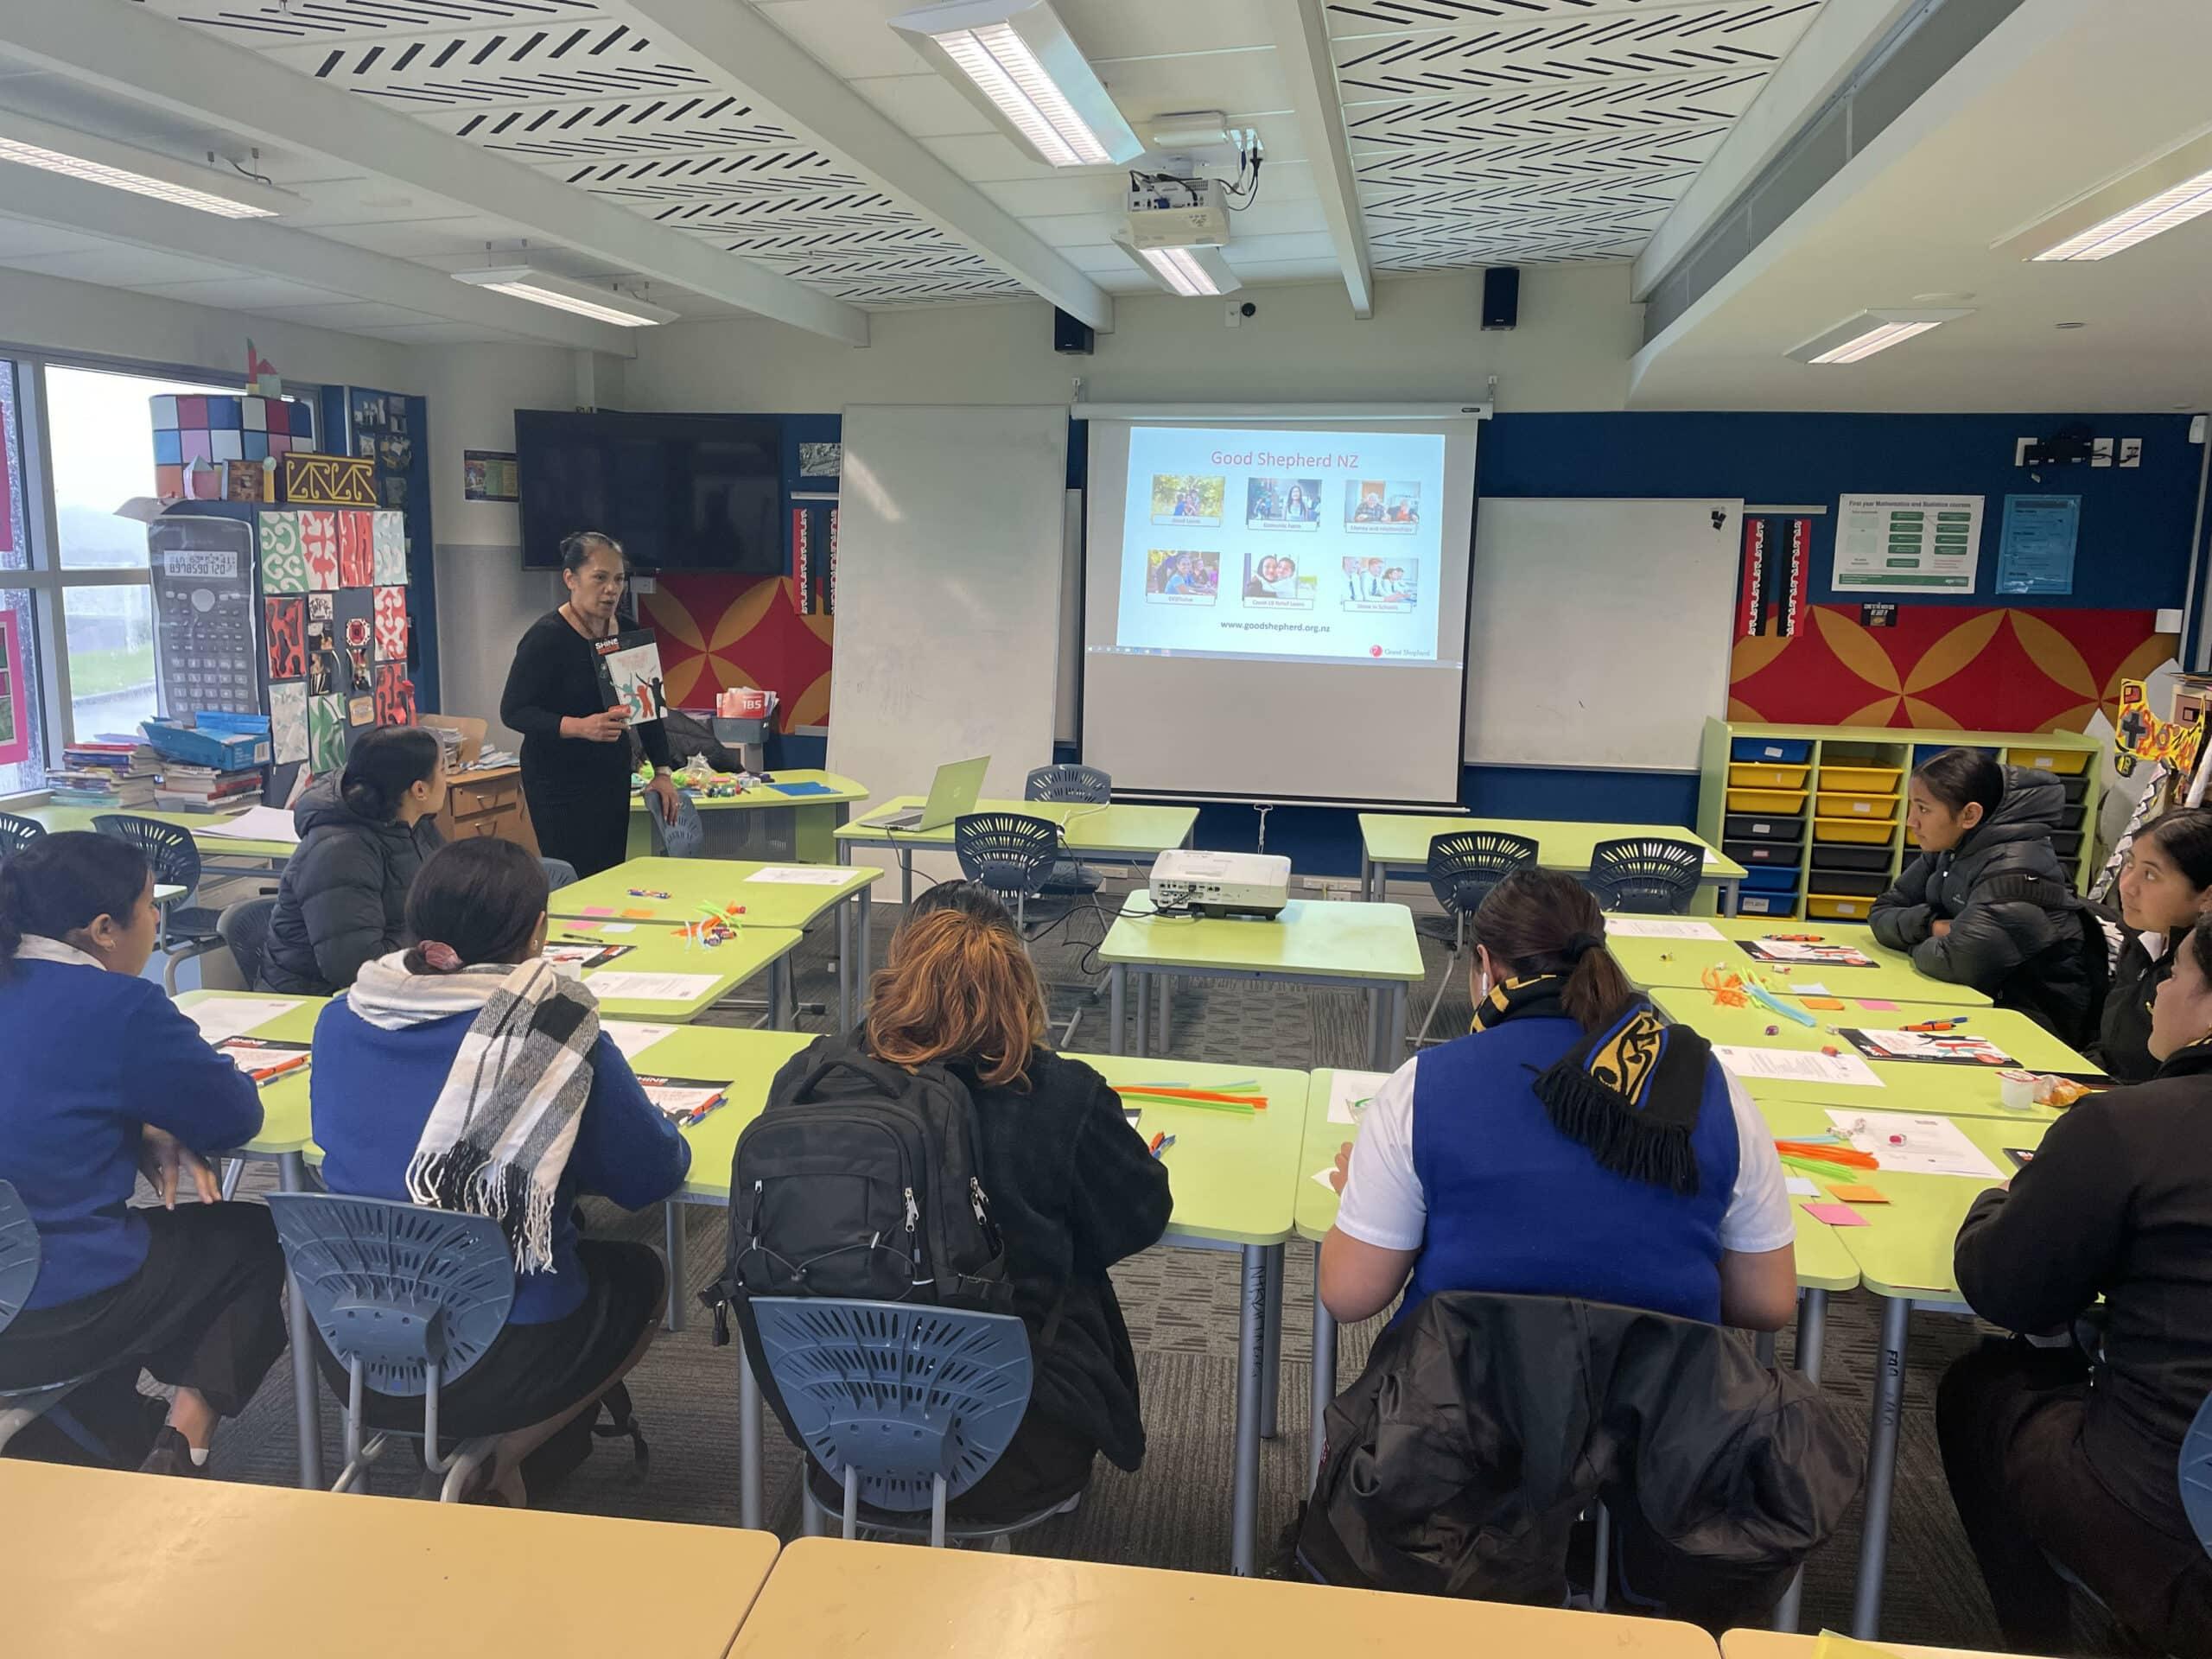 Kiti Tauira teaching Porirua college students